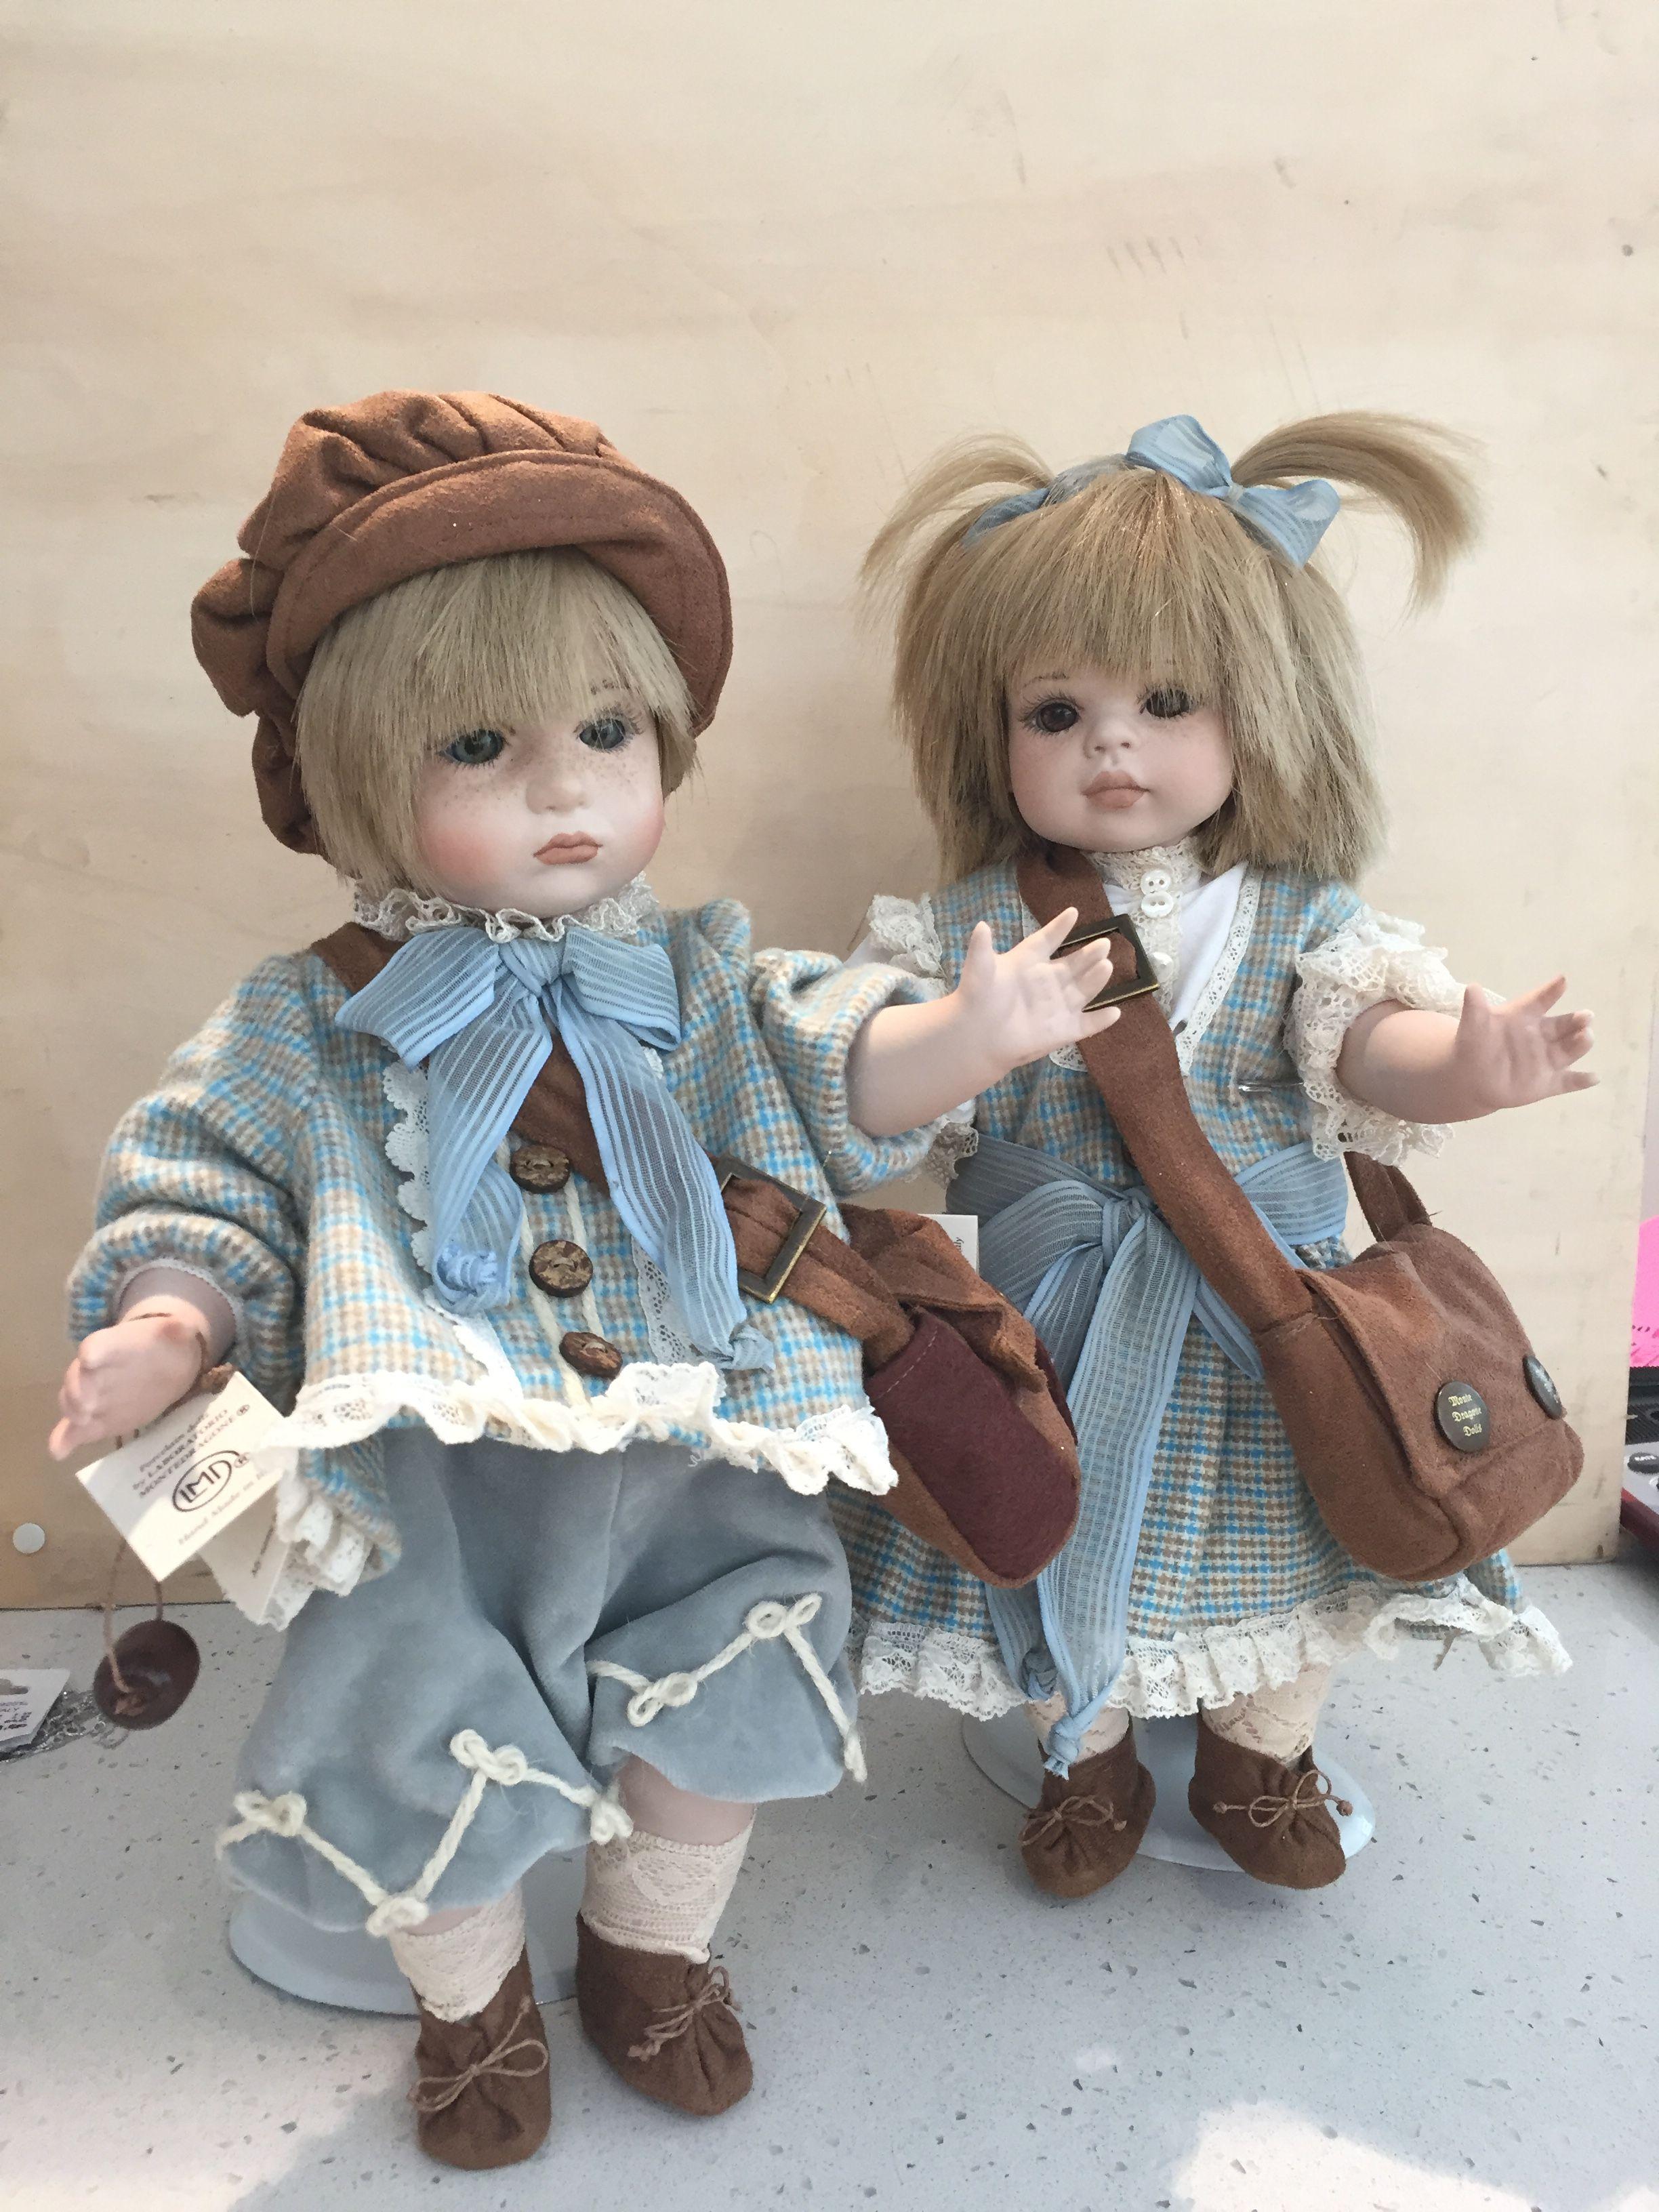 Elisa laboratorios s&l fashions dress collection